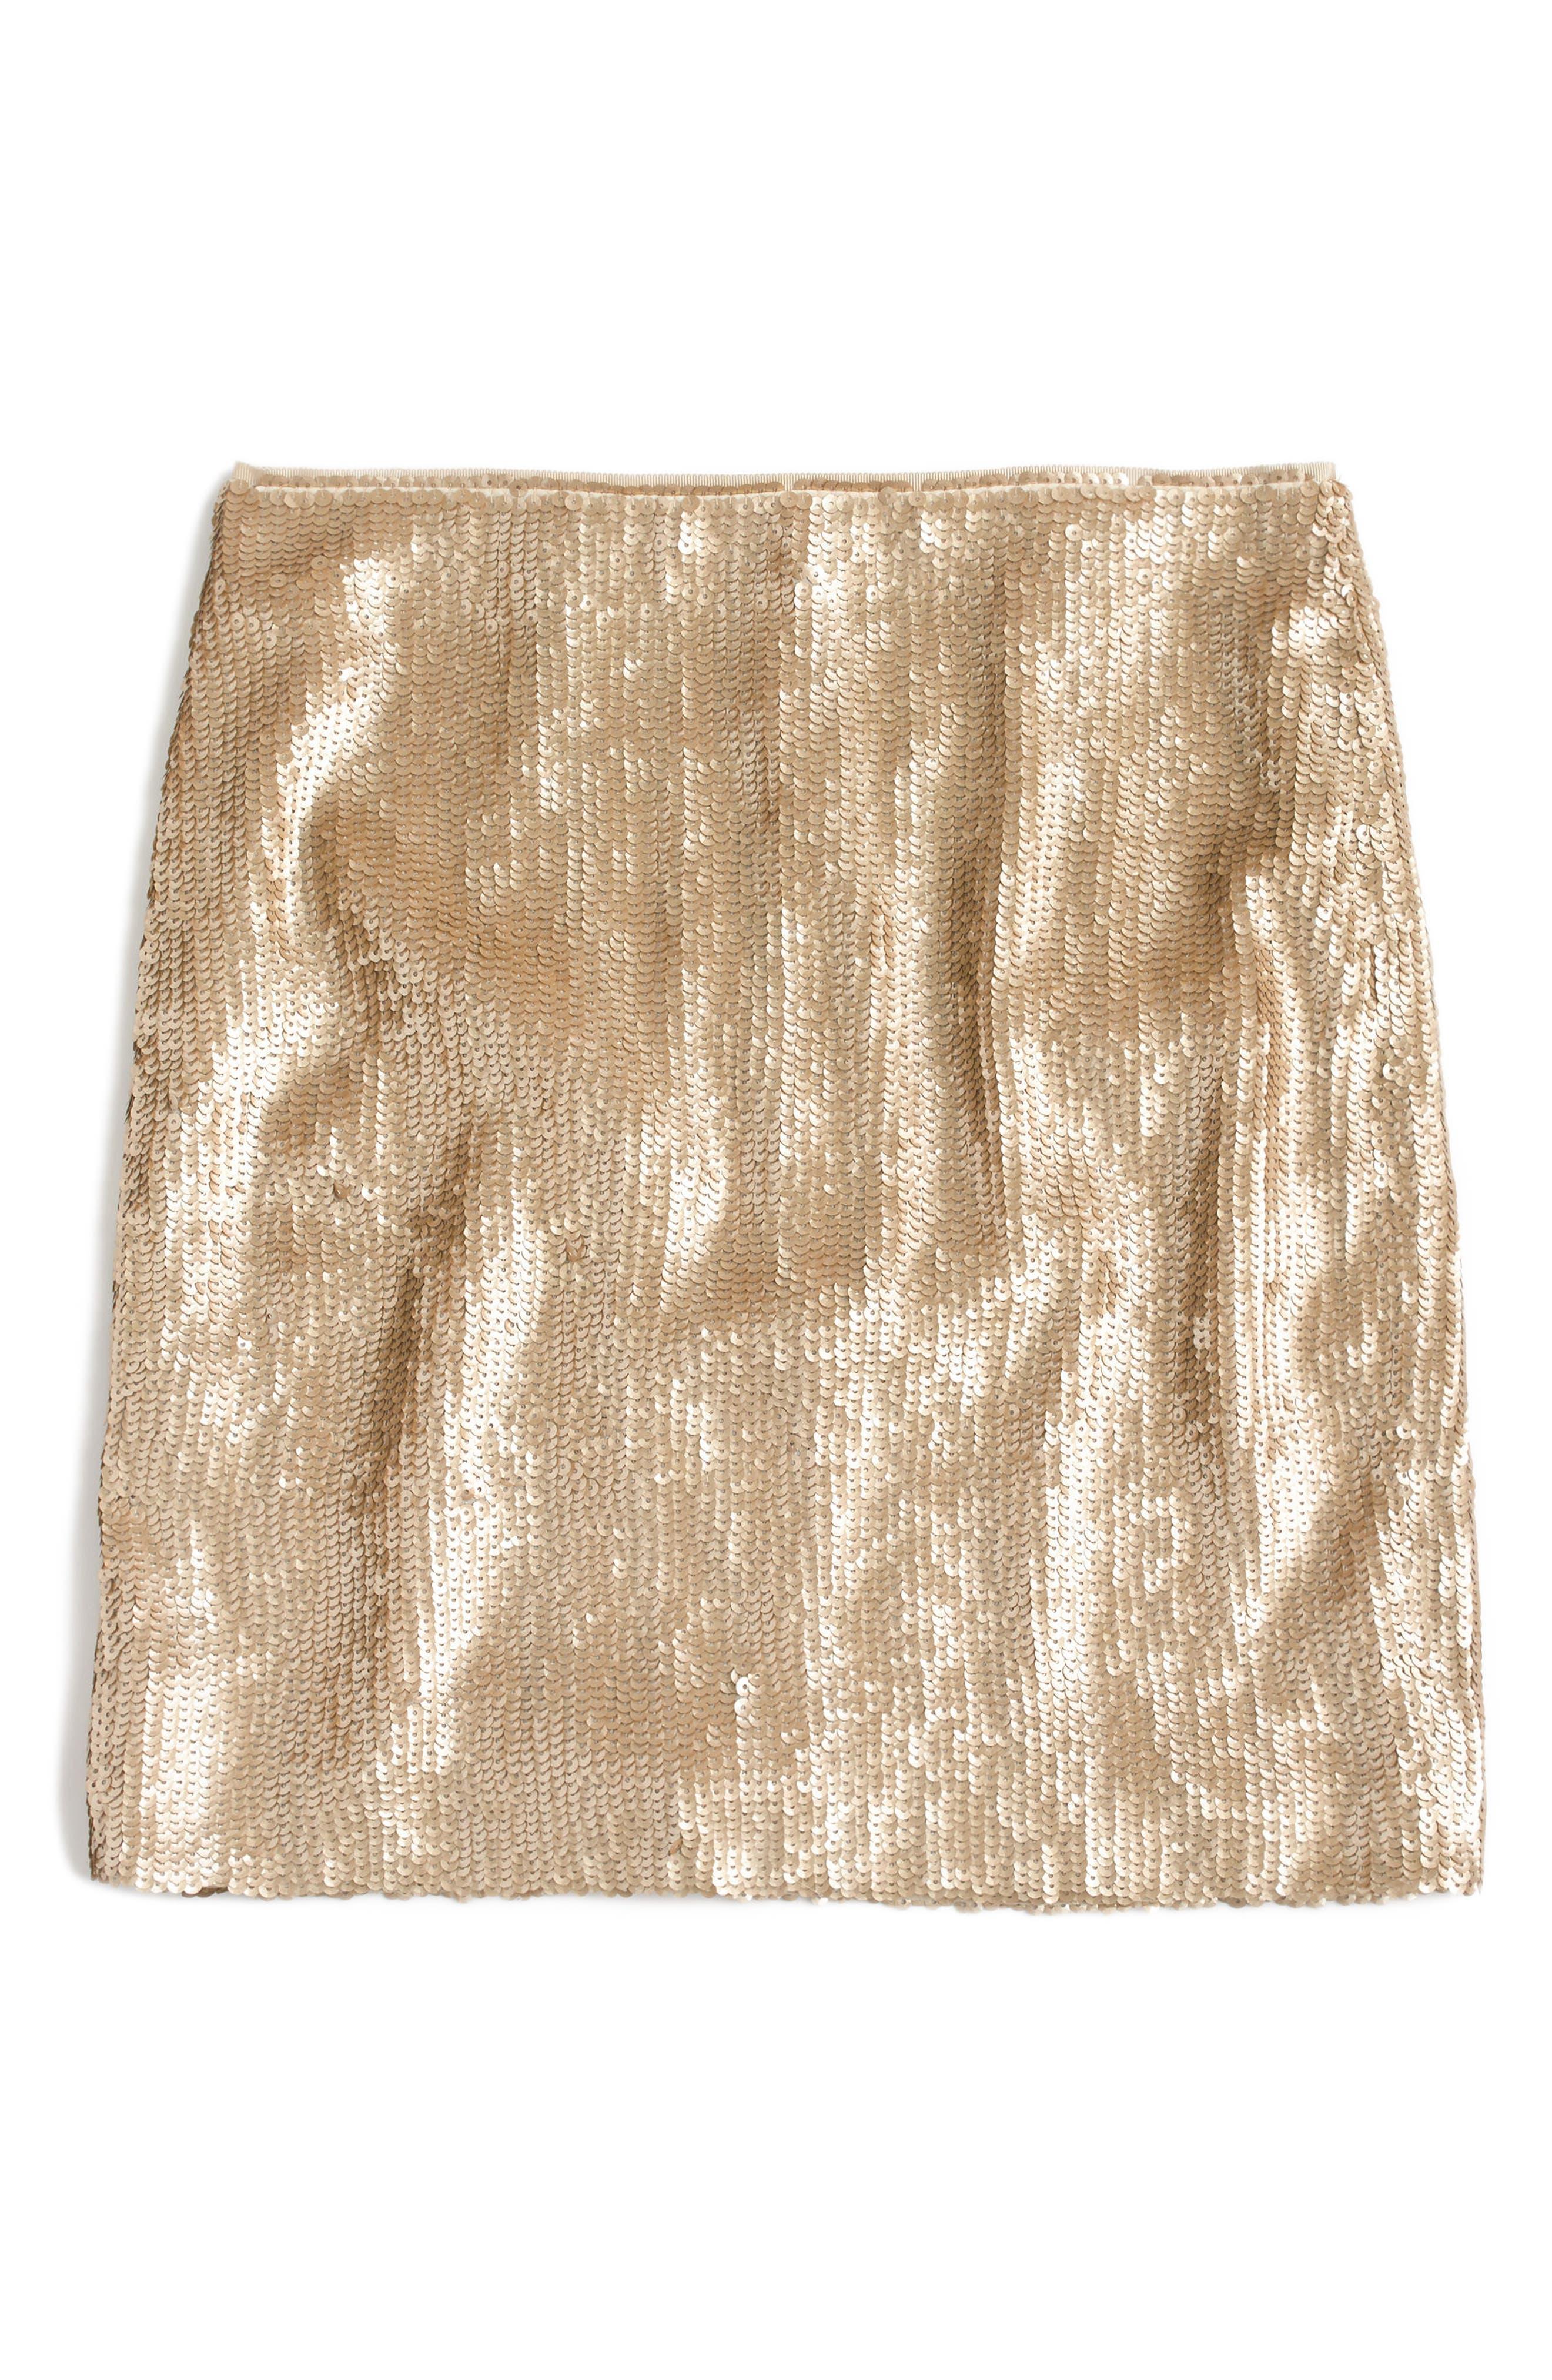 Alternate Image 4  - J.Crew Sequin Miniskirt (Regular & Petite)